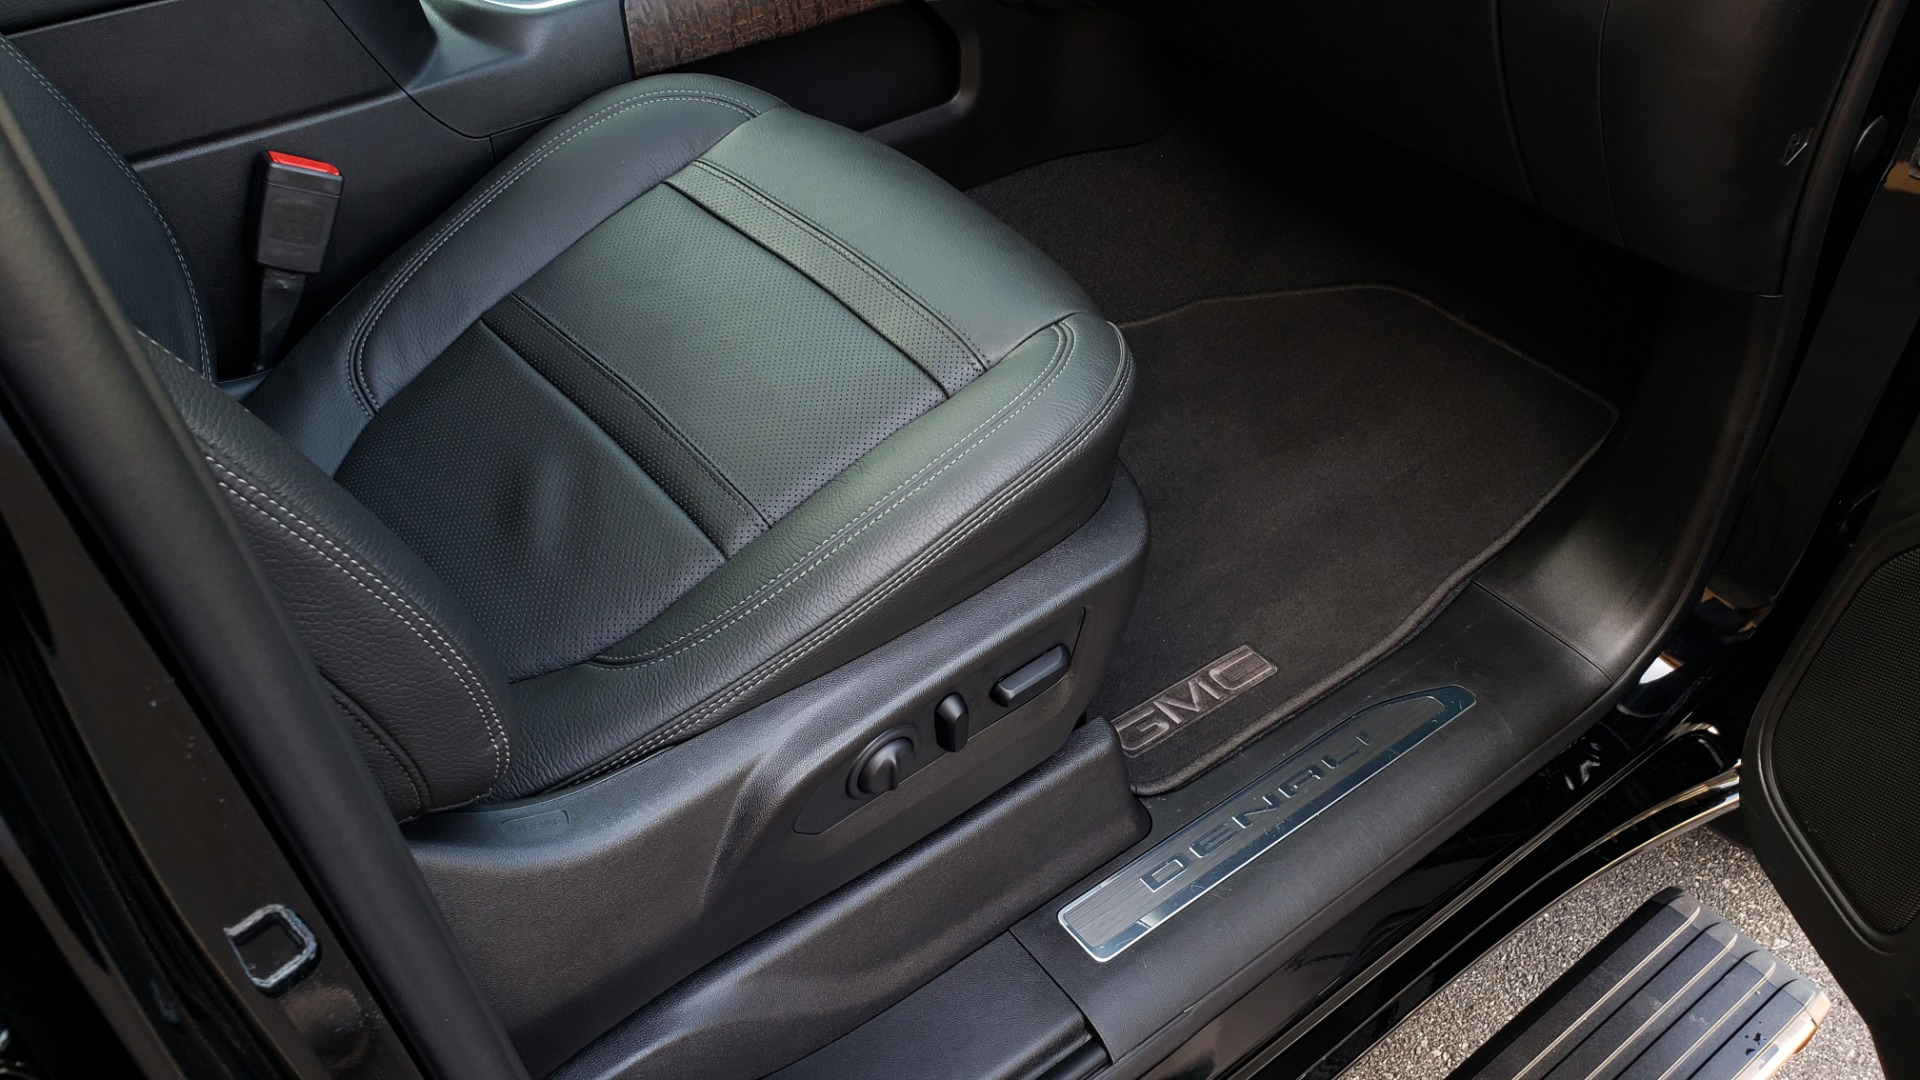 Used 2019 GMC SIERRA 1500 DENALI ULTIMATE 4WD / NAV / TECH PKG / DRVR ALRT for sale Sold at Formula Imports in Charlotte NC 28227 70